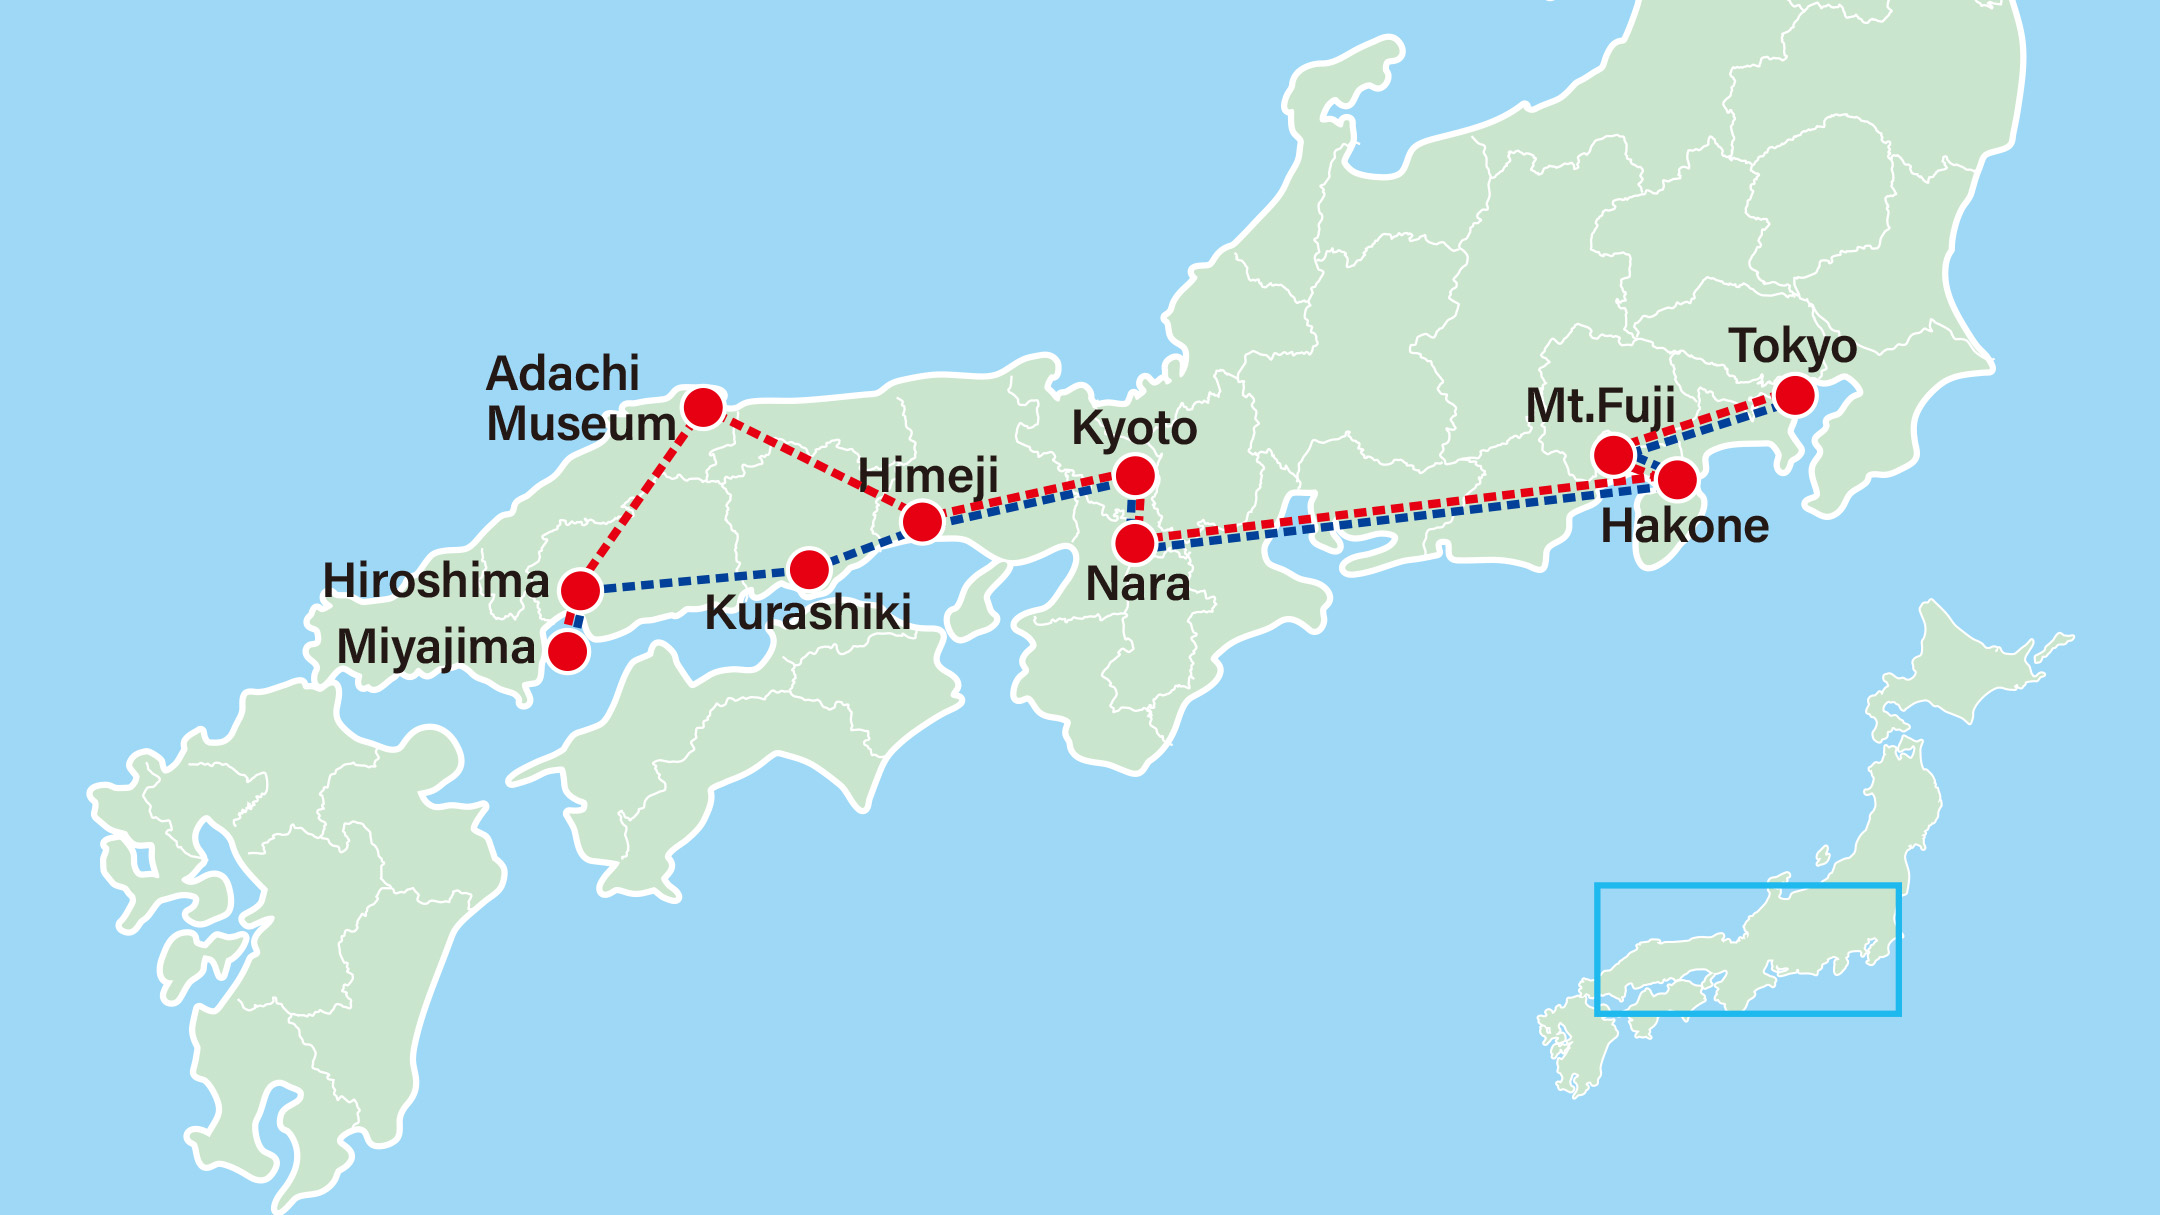 Highlights of Japan with Anime 10 Days -Tokyo-Yokohama-Mt. Fuji-Hakone-Nara-Kyoto-Himeji-Kurashiki-Adachi-Hiroshima-Miyajima